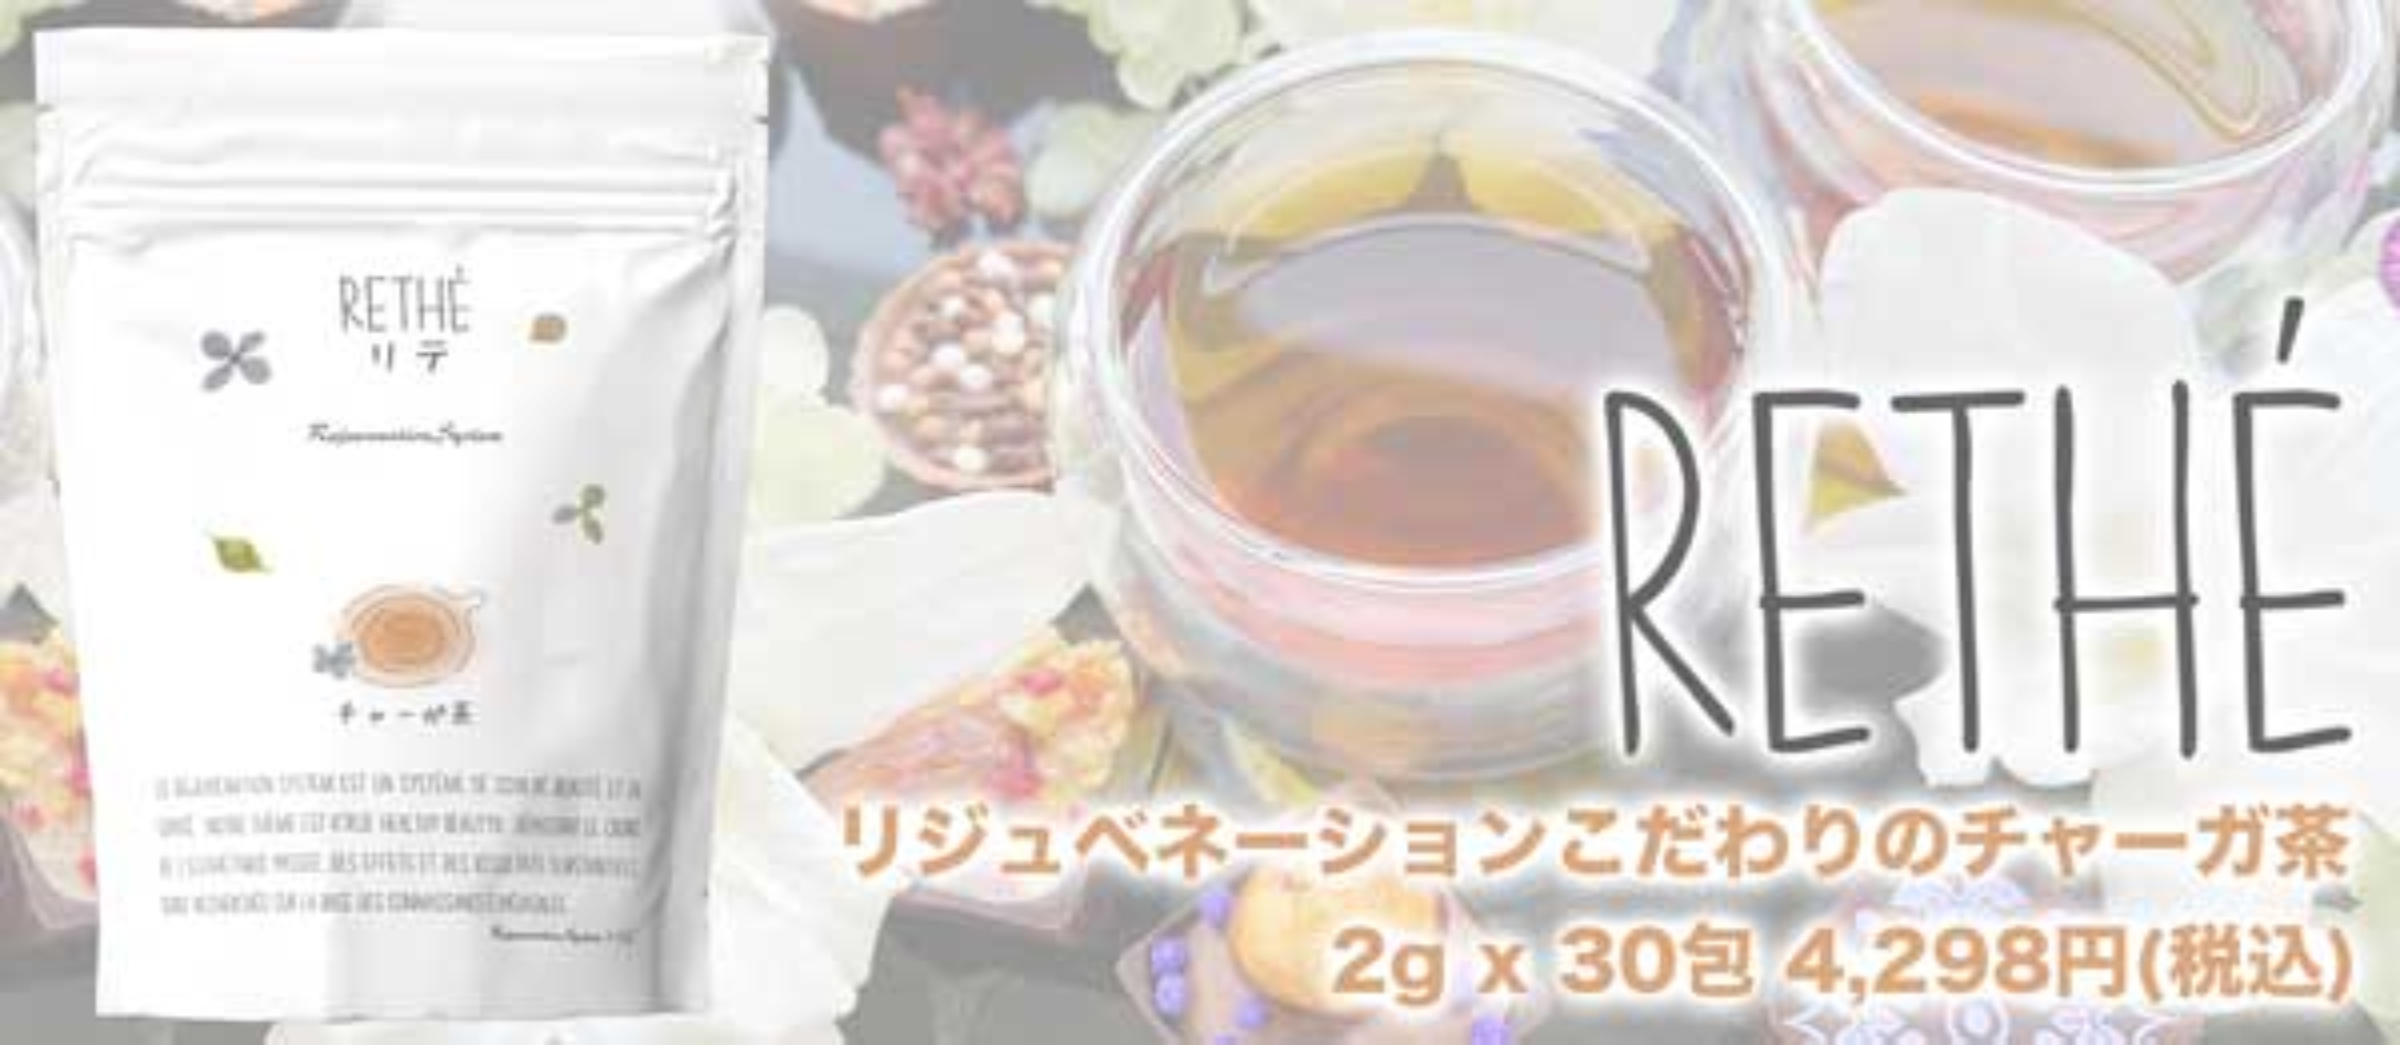 RETHÉ product